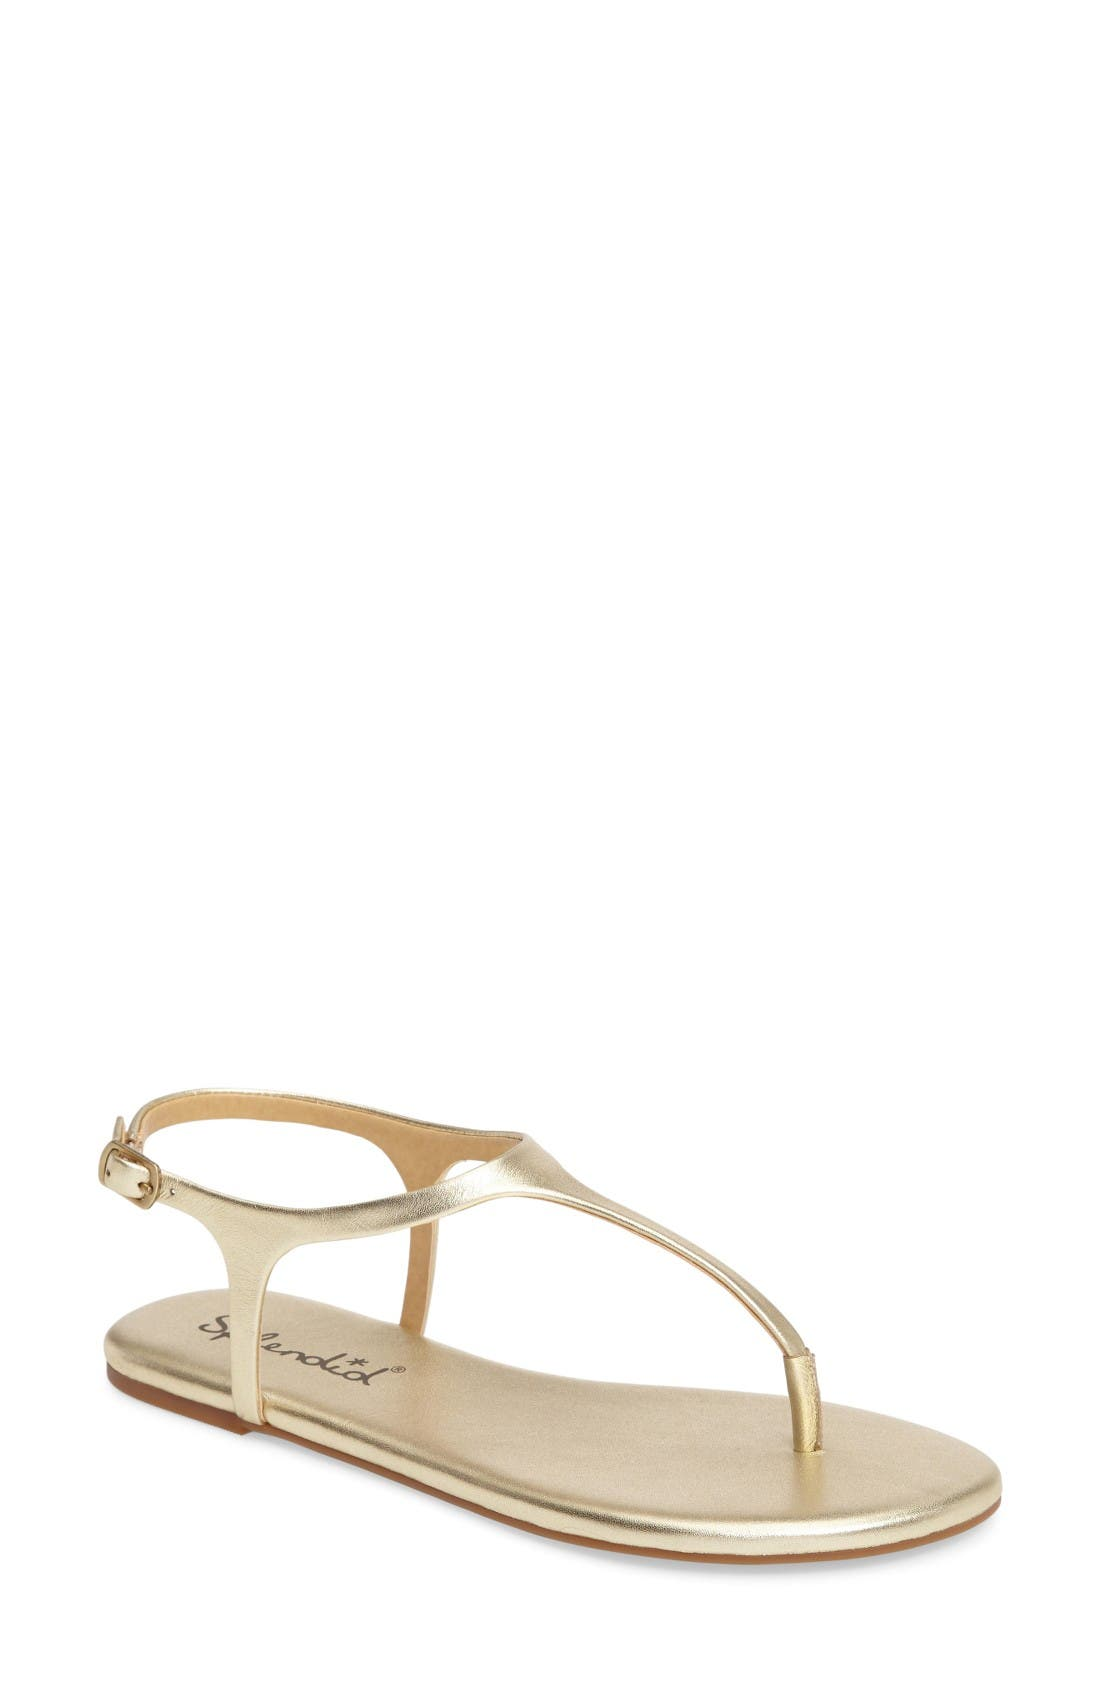 'Mason' Sandal,                         Main,                         color, Gold Metal